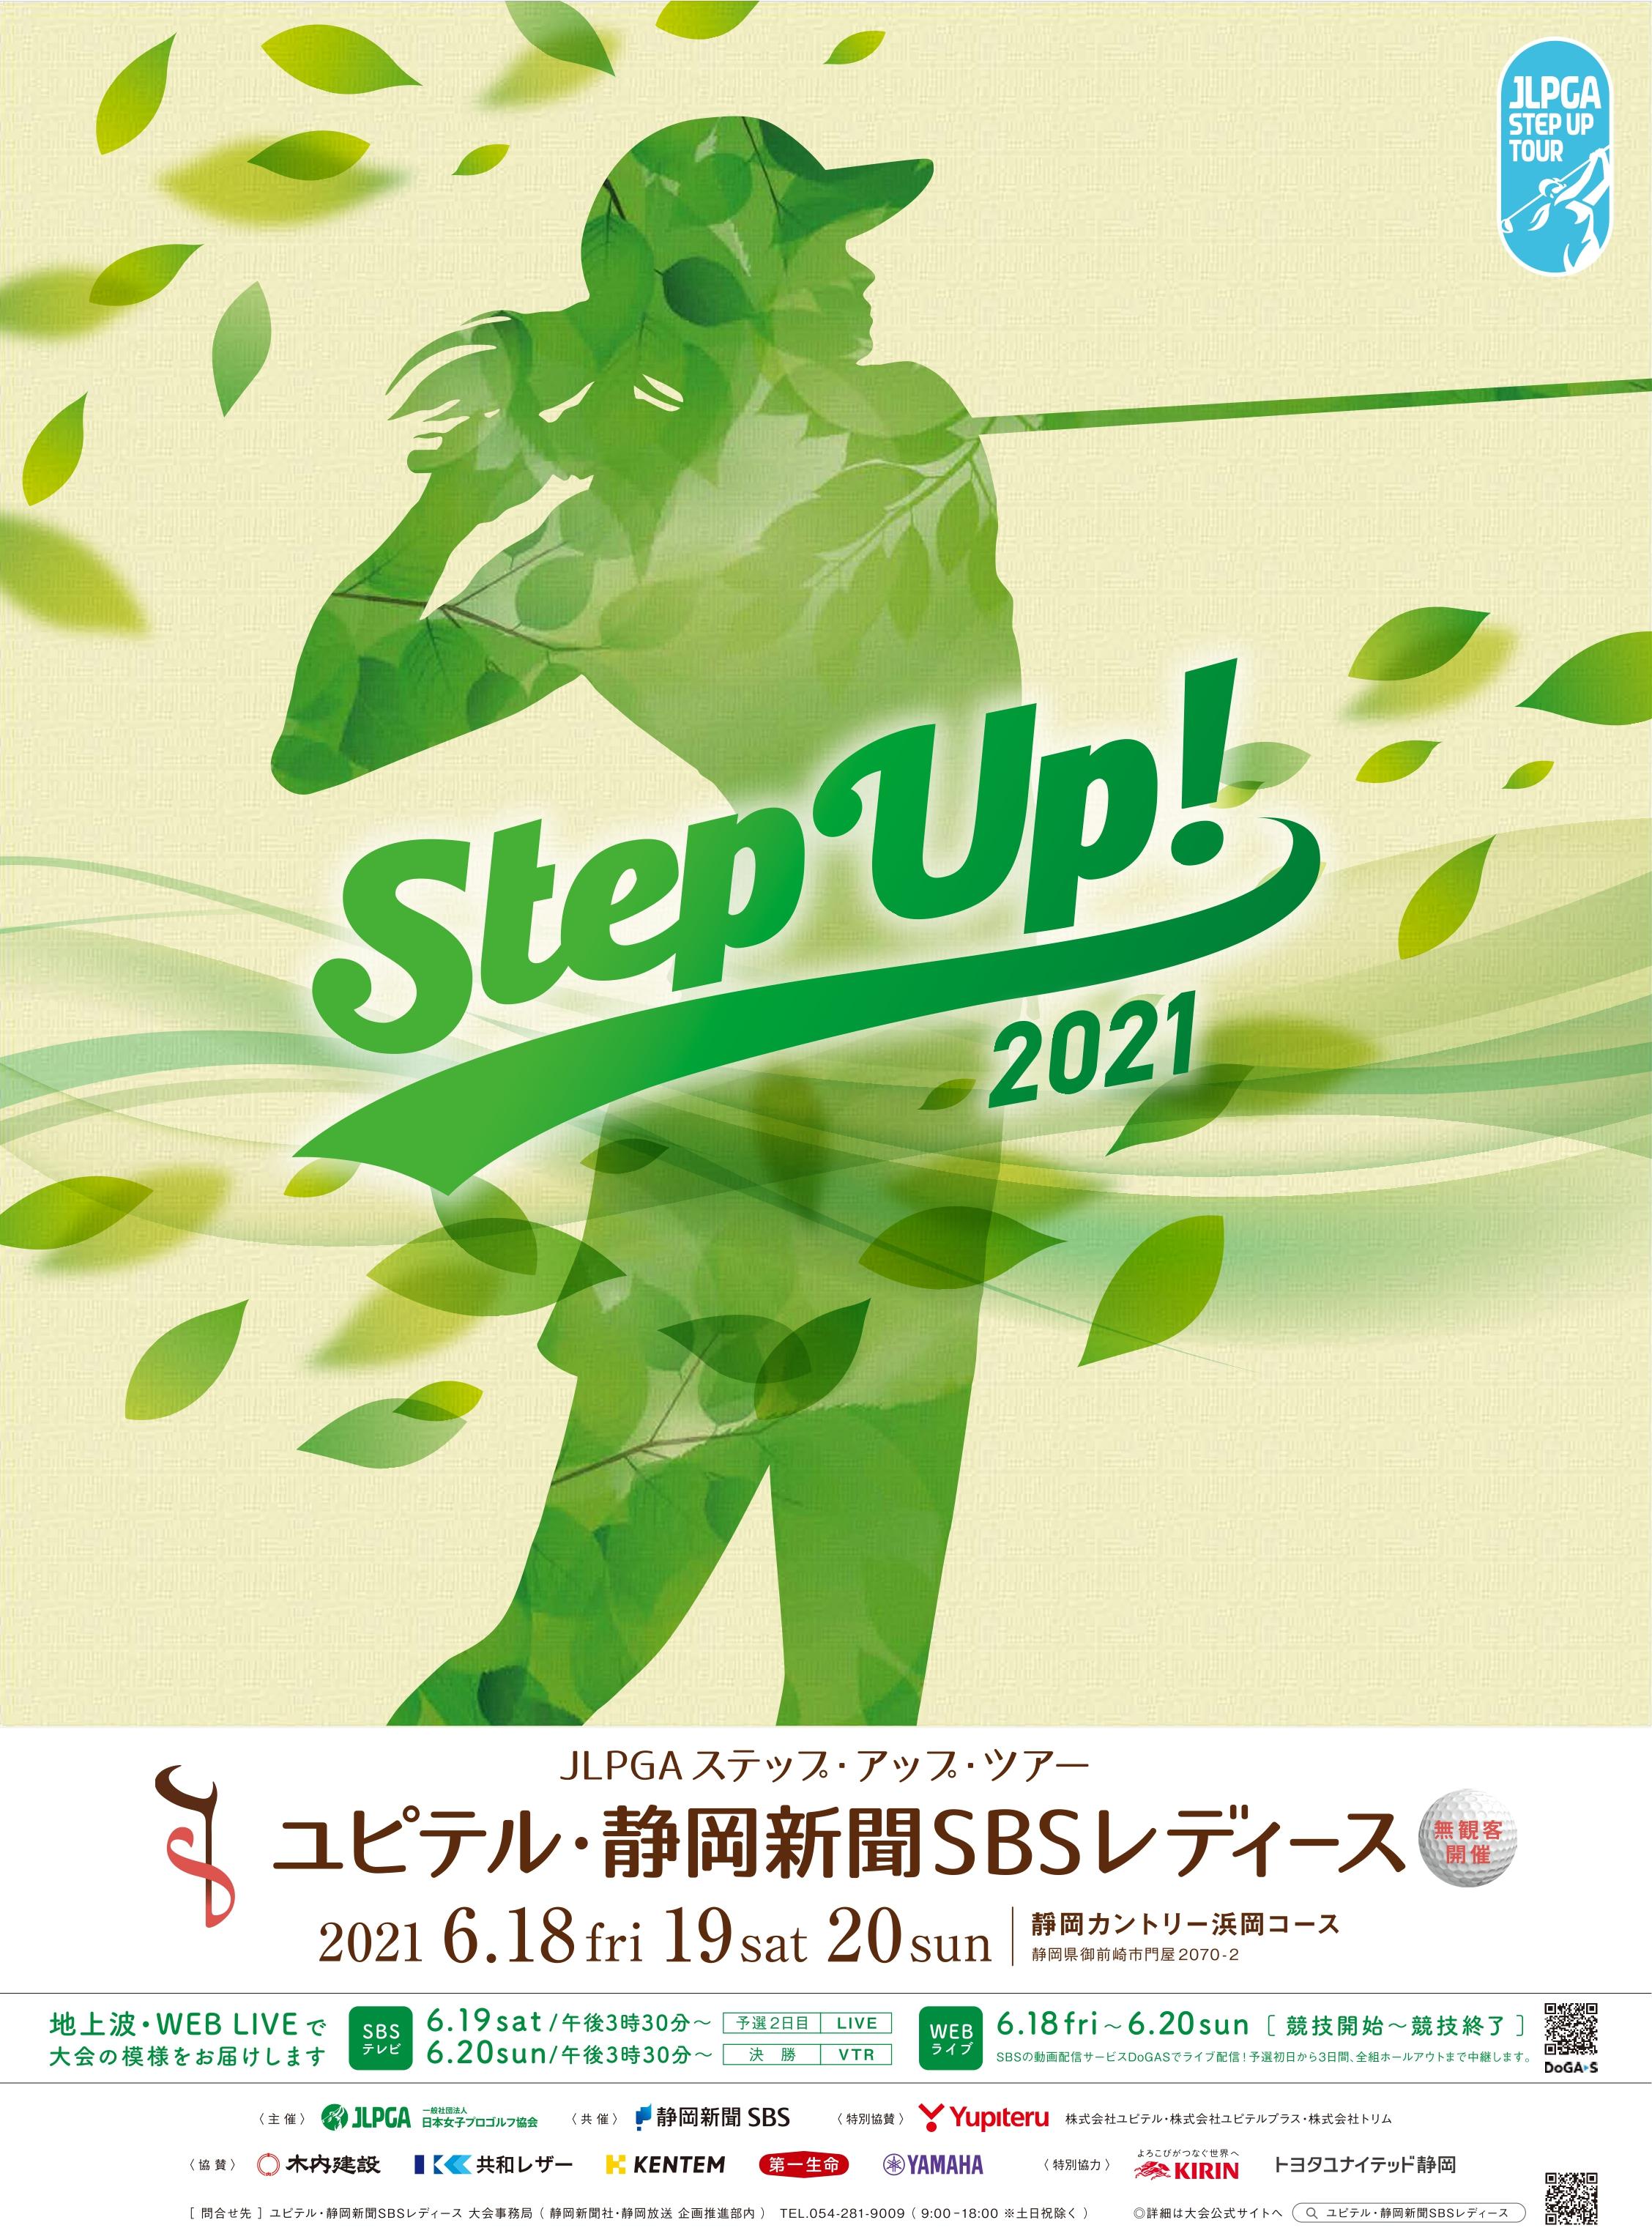 The Shizuoka Shimbun & SBS Ladies